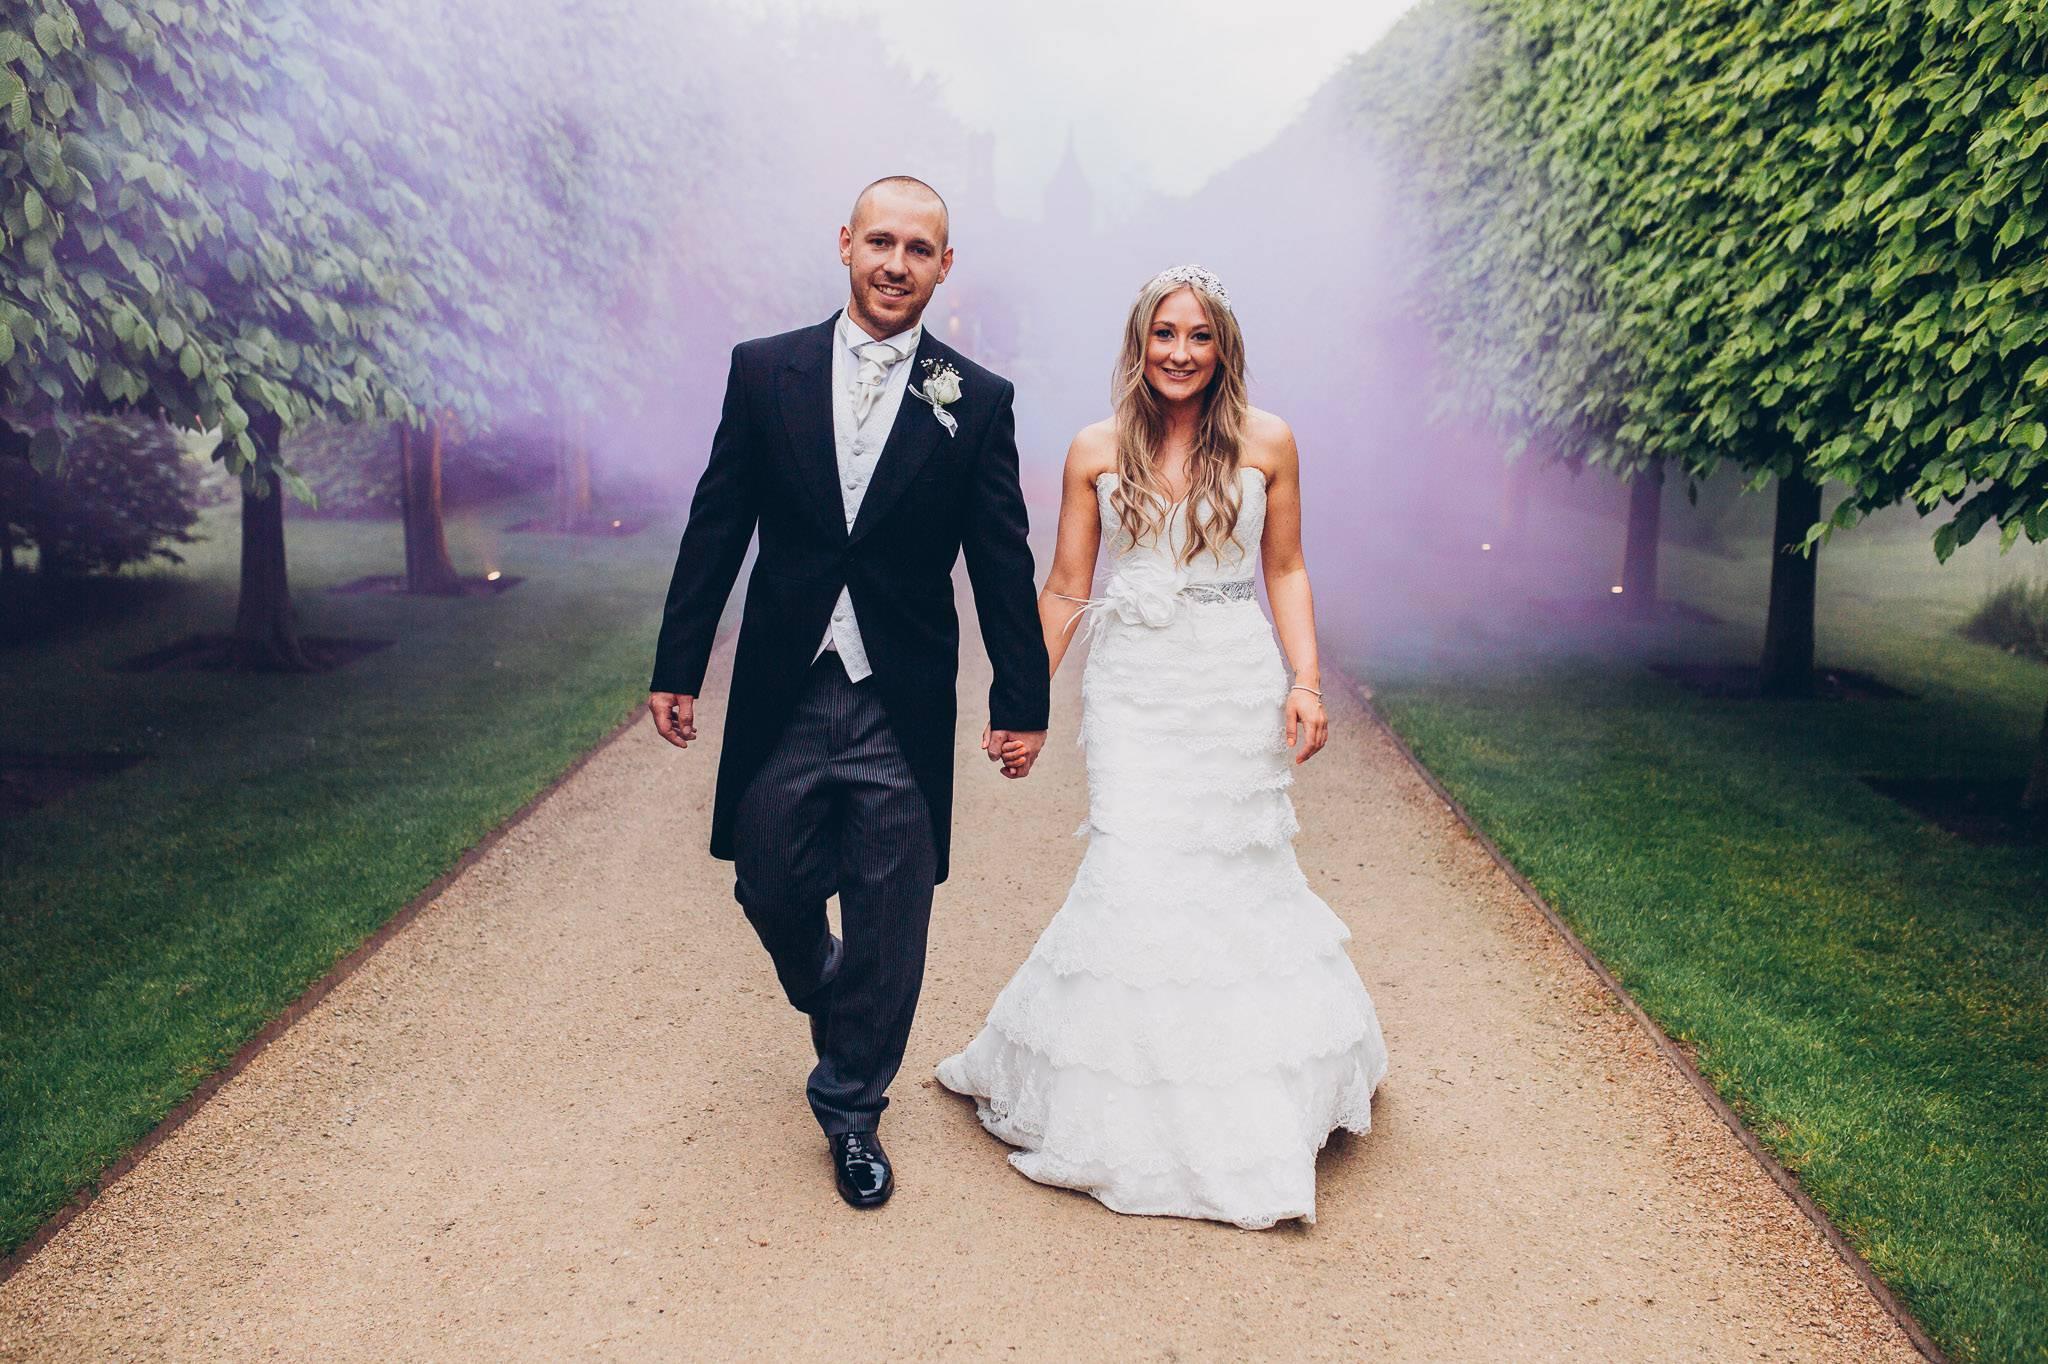 shropshire-wedding-photography 31.jpg